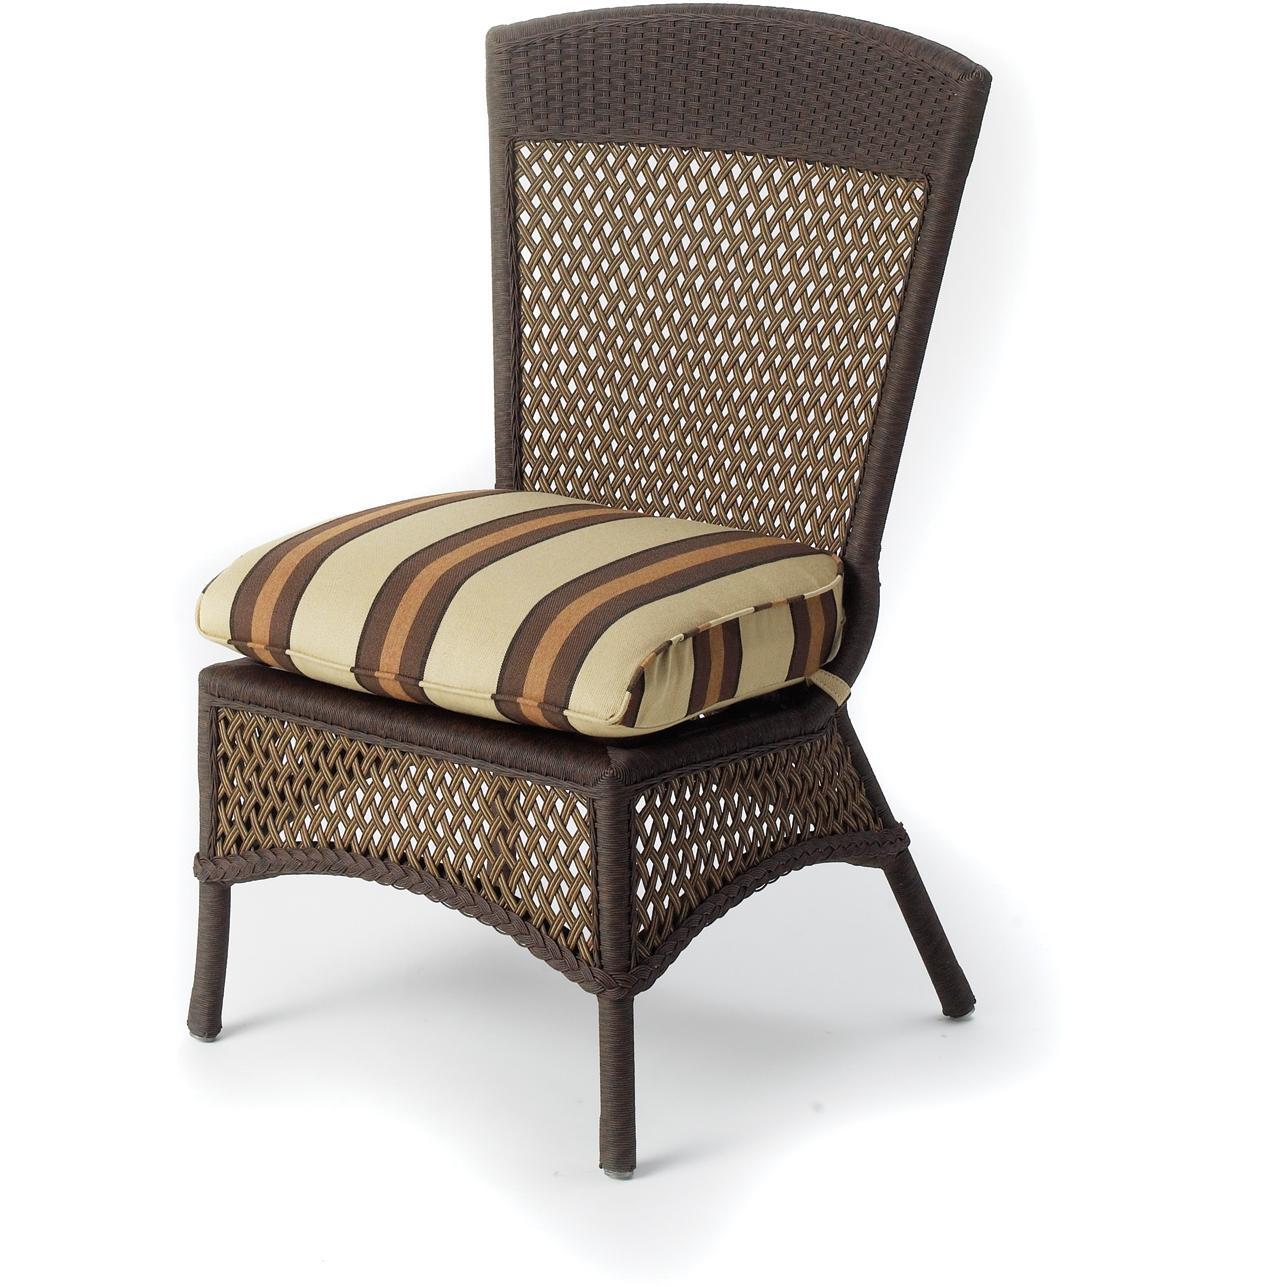 Lloyd Flanders Grand Traverse Woven Vinyl Outdoor Patio Armless Dining Chair - Caramel Finish